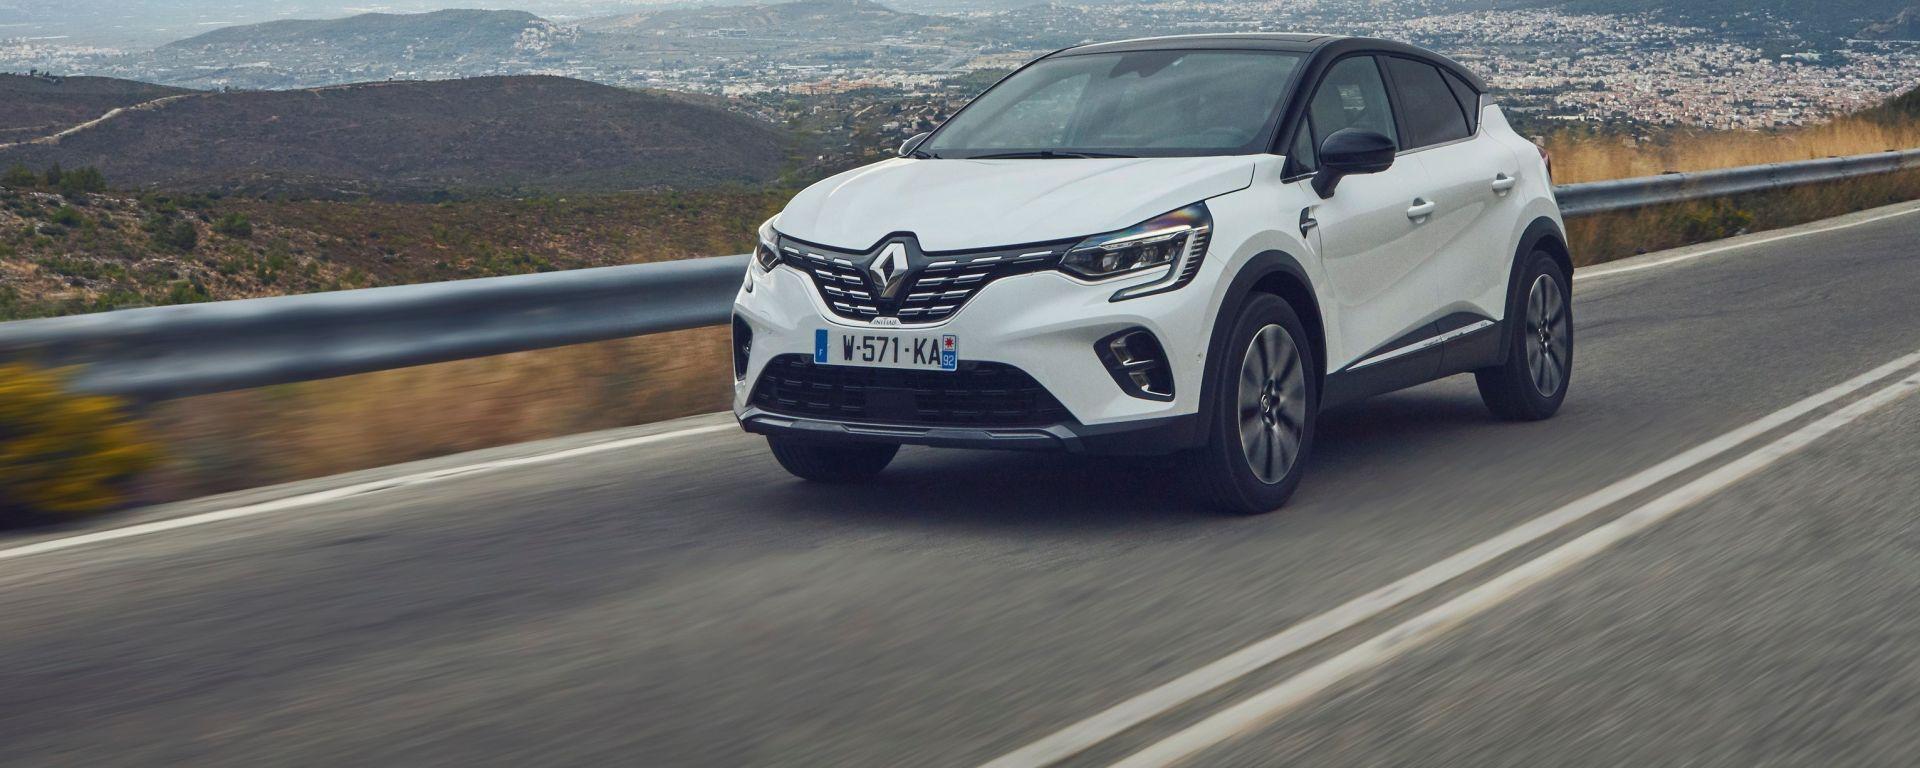 Renault Captur 2019: le impressioni dopo la prova su strada